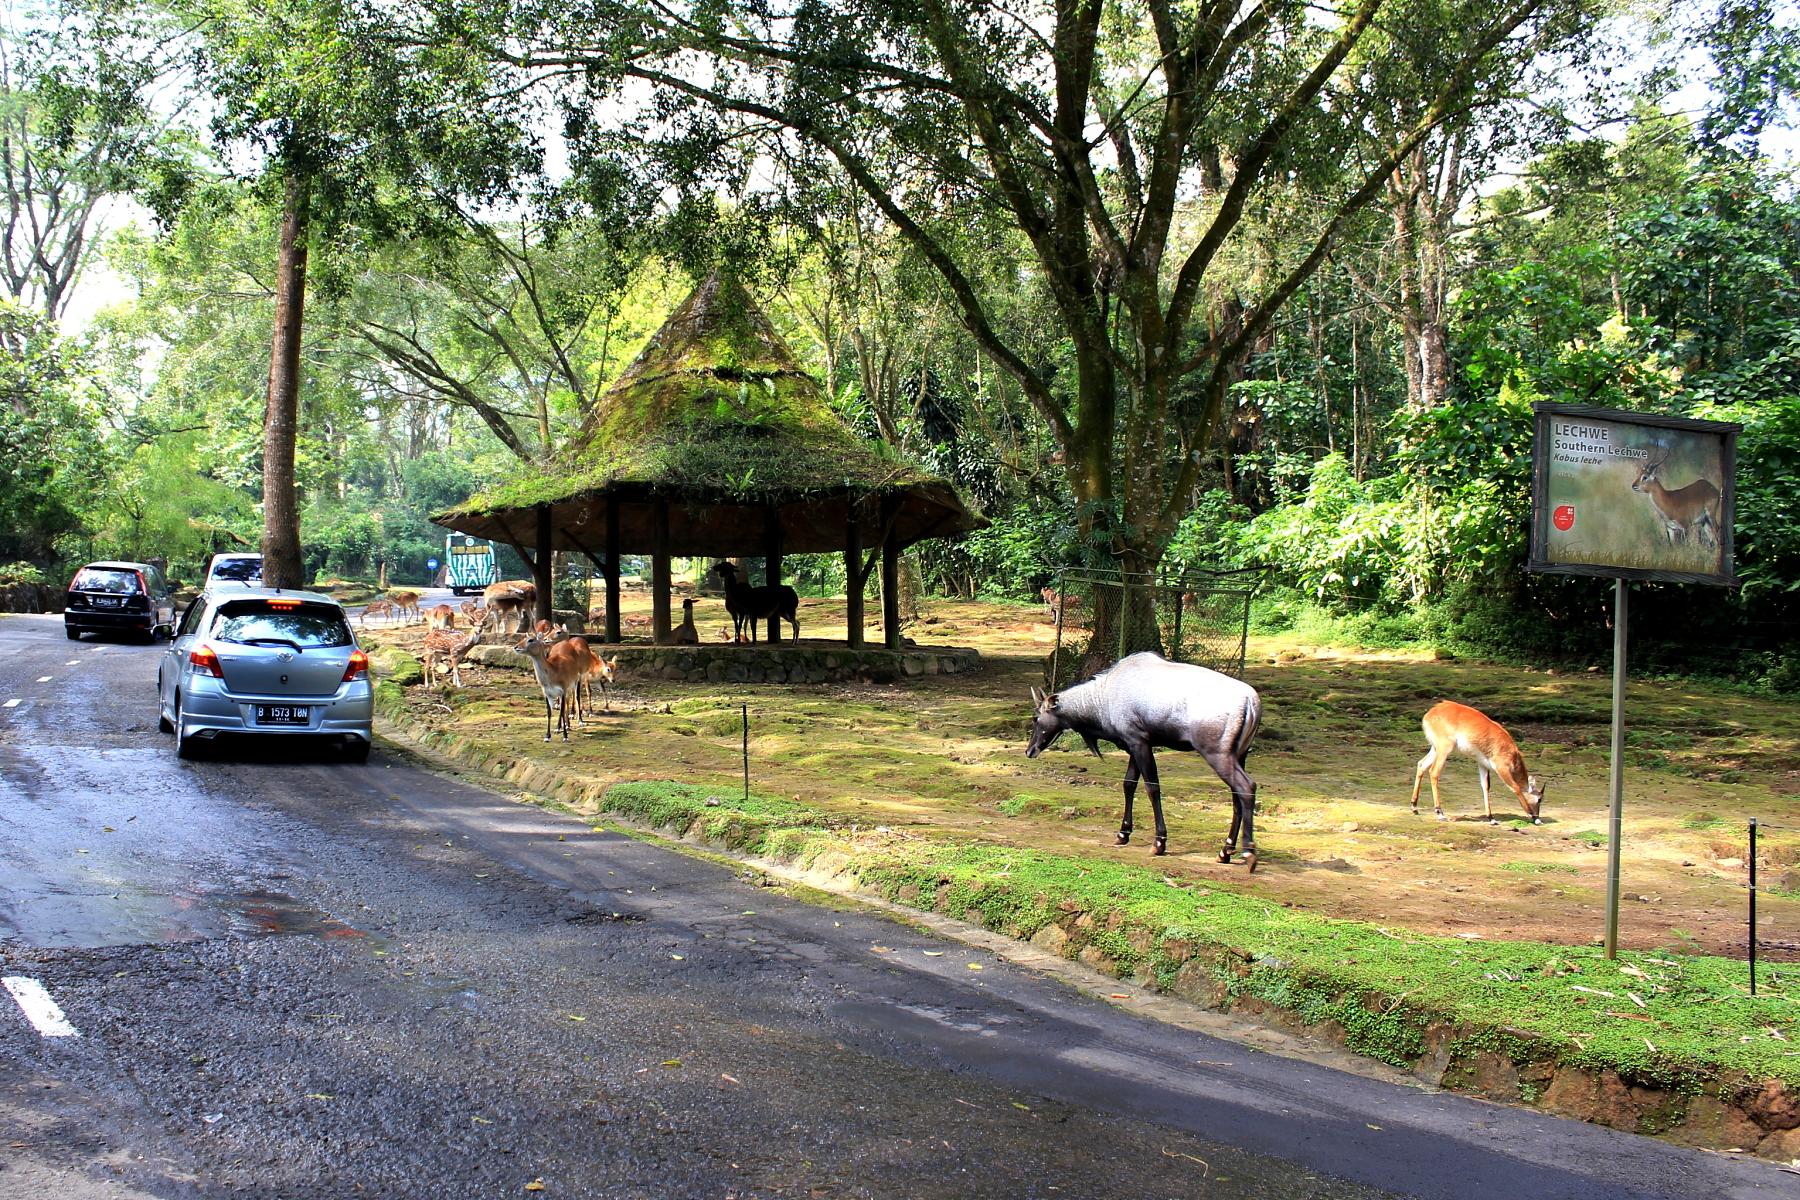 Bali safari and marine park or taman safari iii is a branch of taman